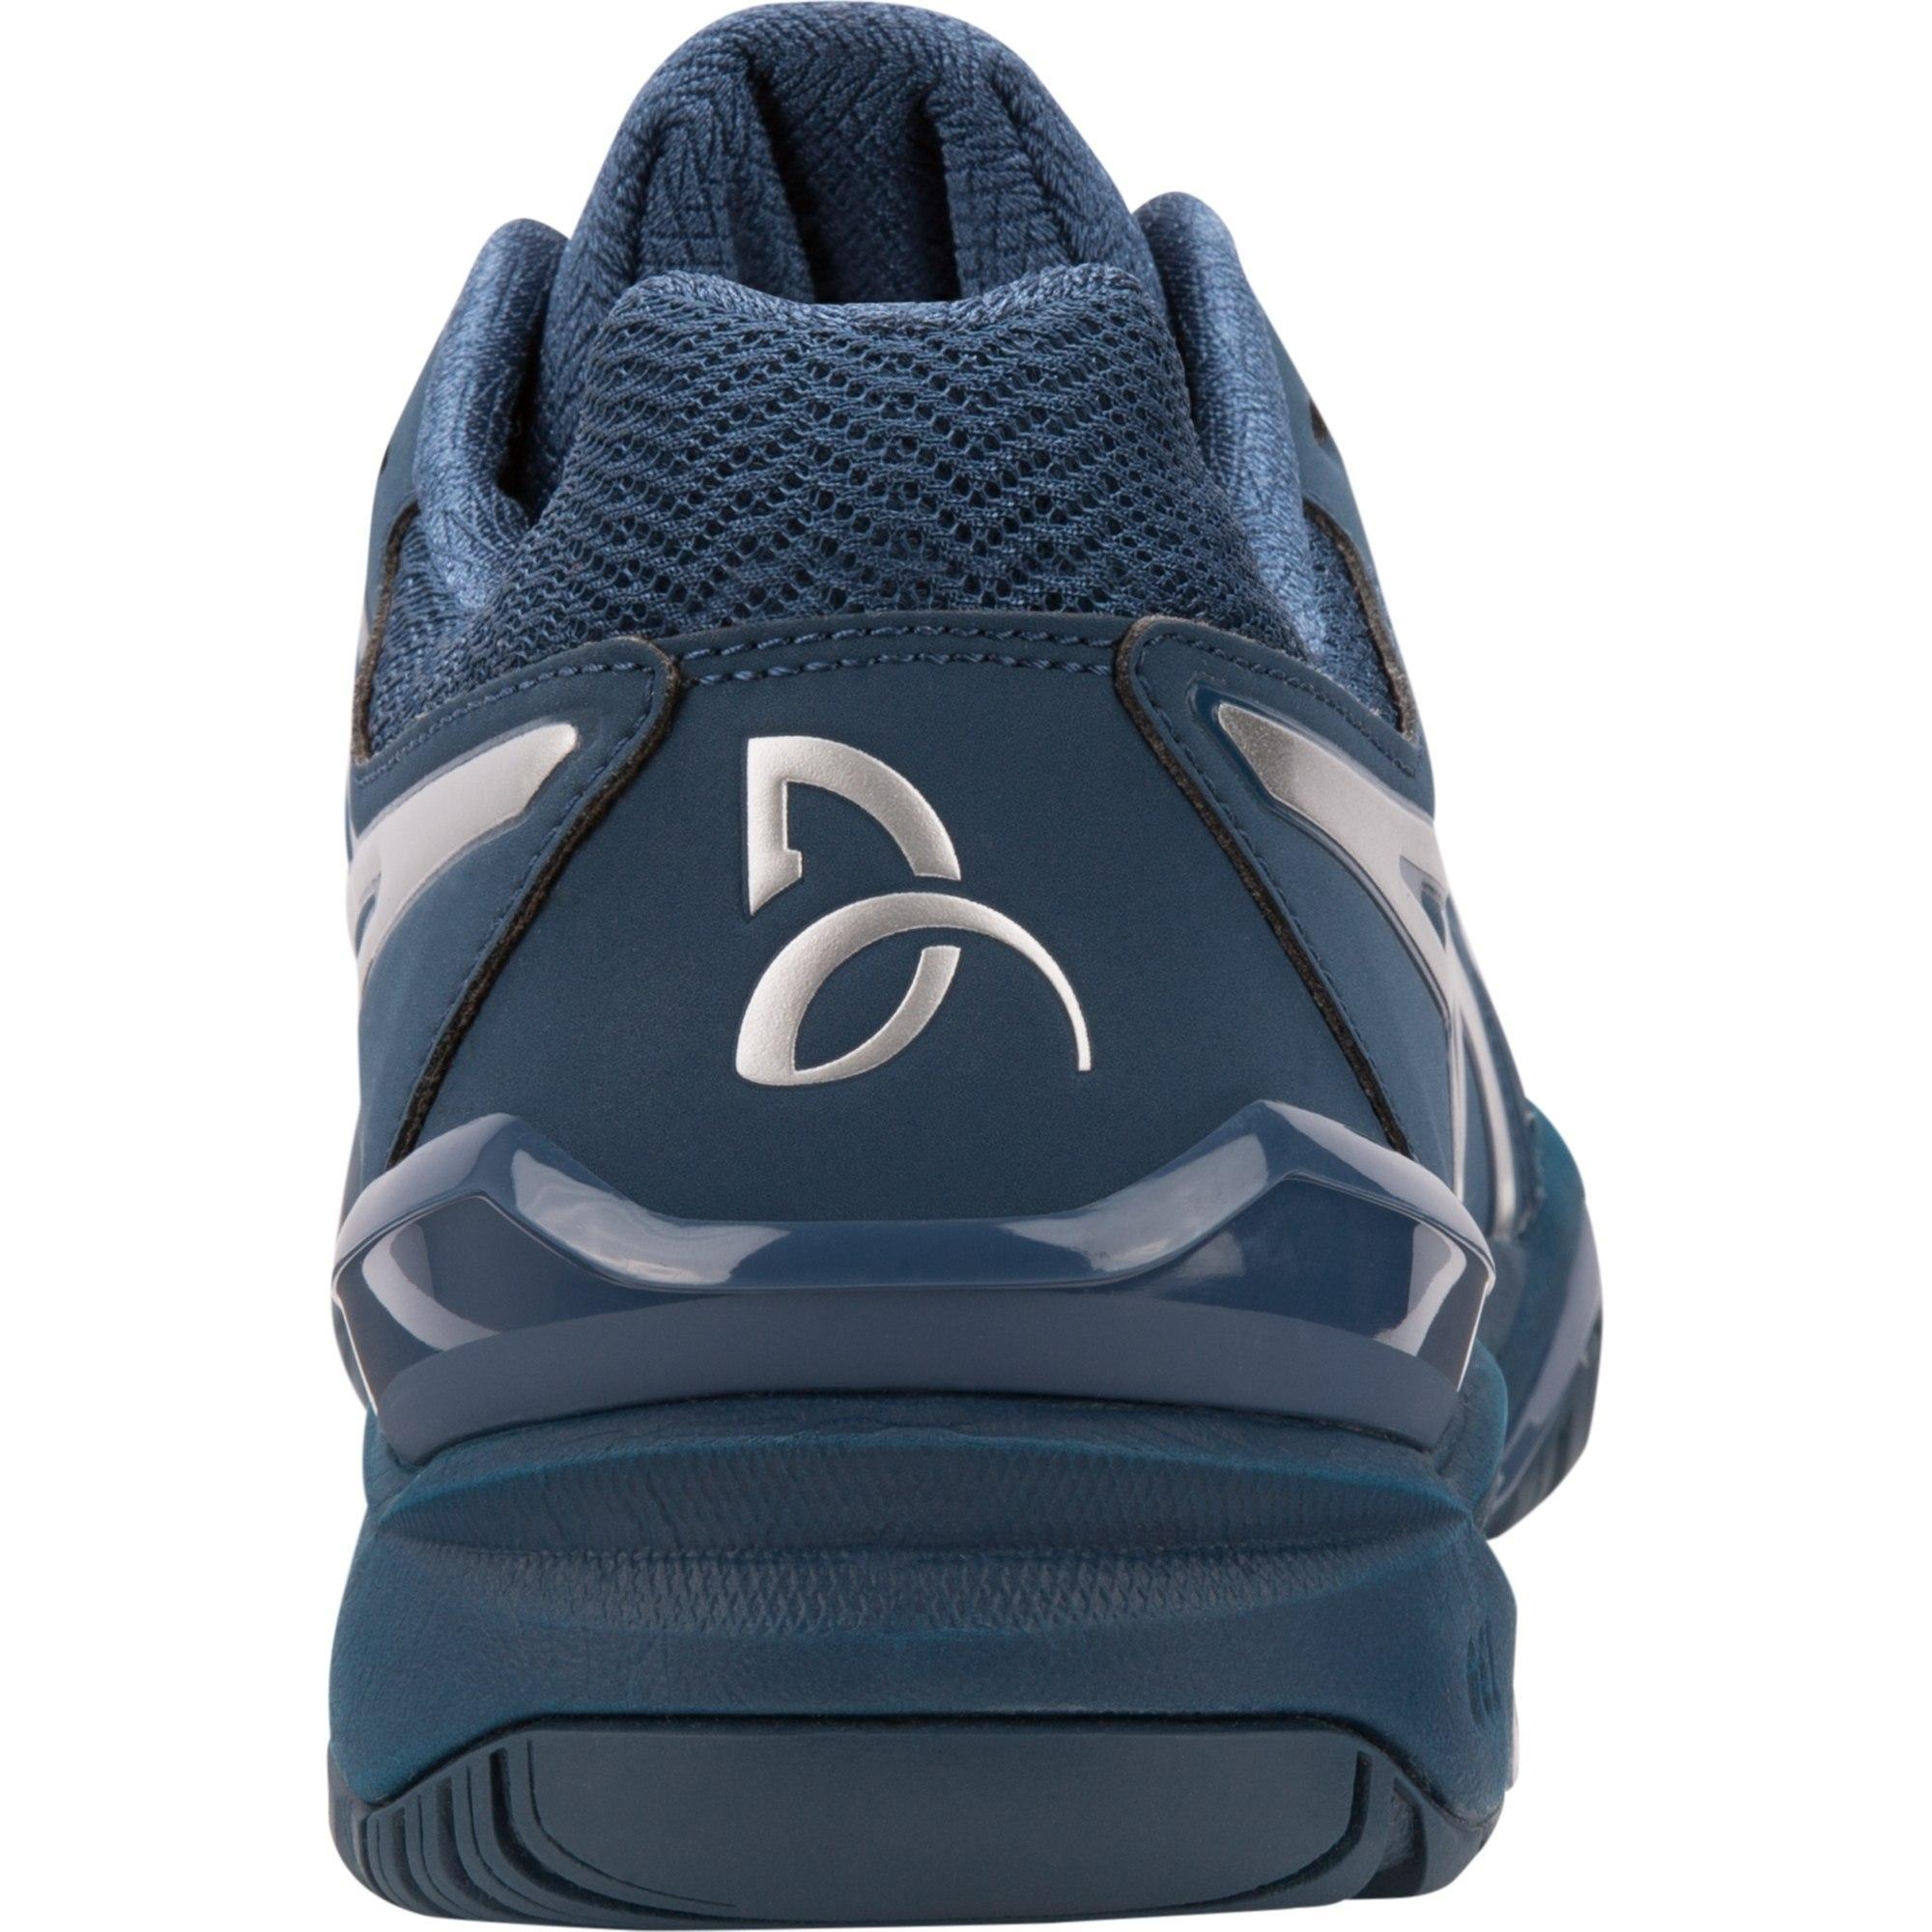 8717e003fc3b Asics Mens GEL-Resolution Novak Tennis Shoes - Peacoat Silver ...